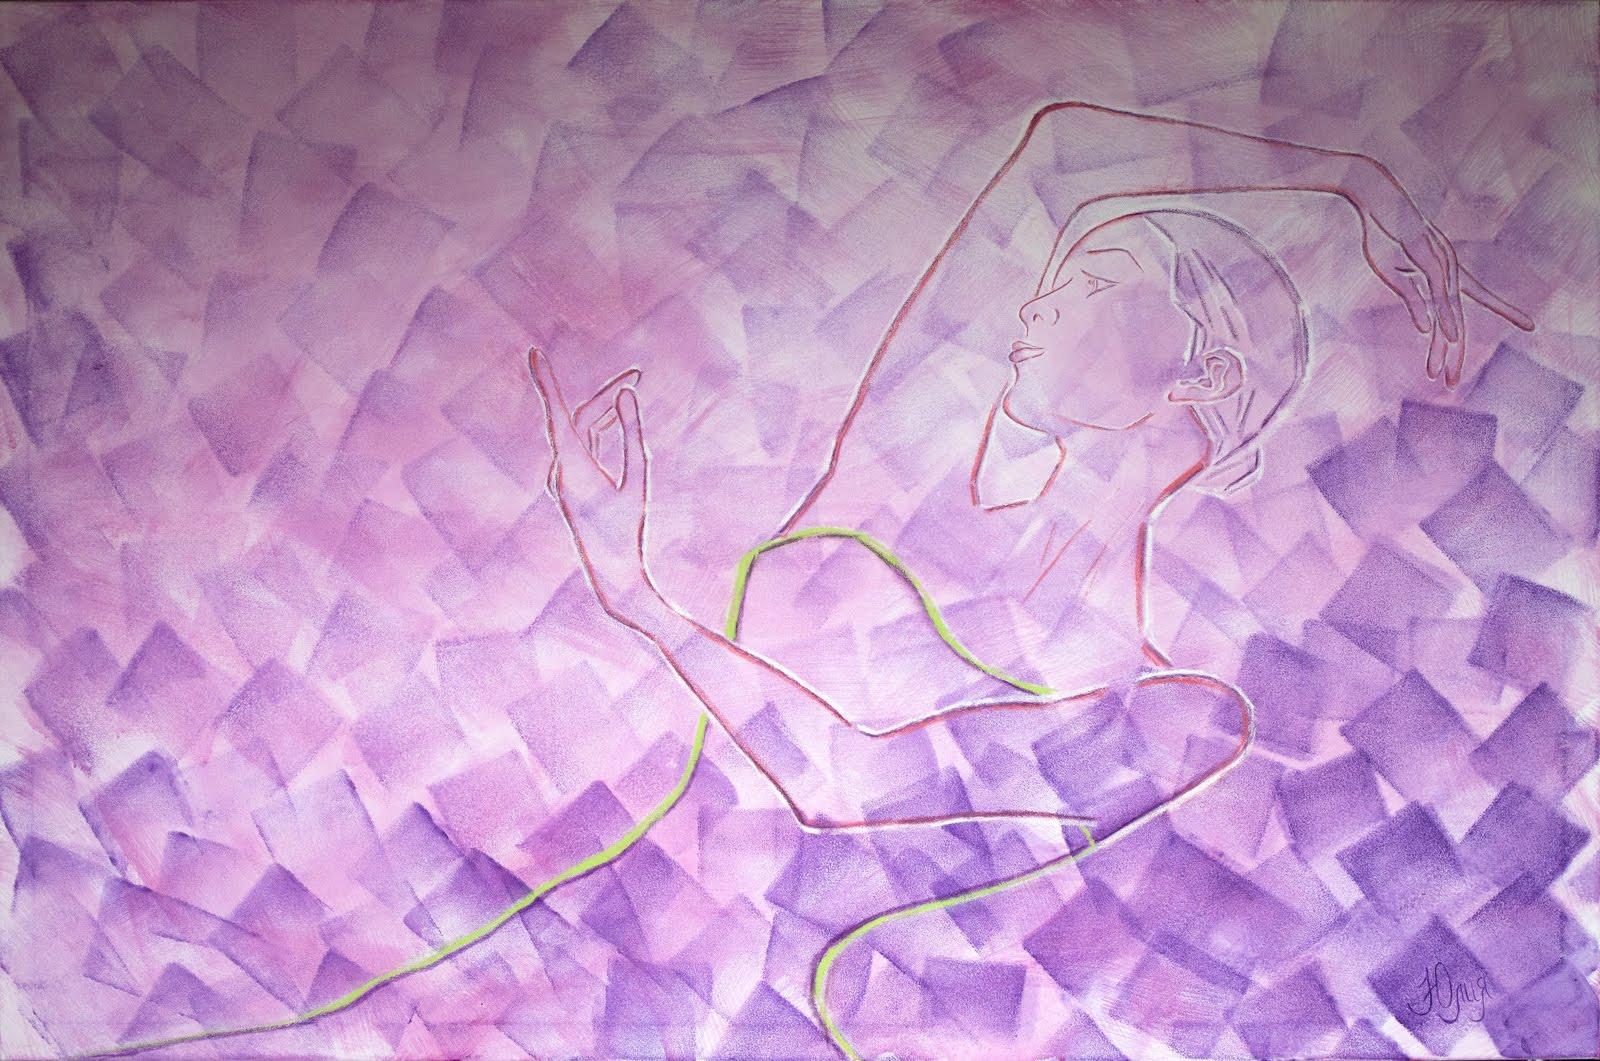 Oil pastel, acrylic on canvas, 100x150 cm